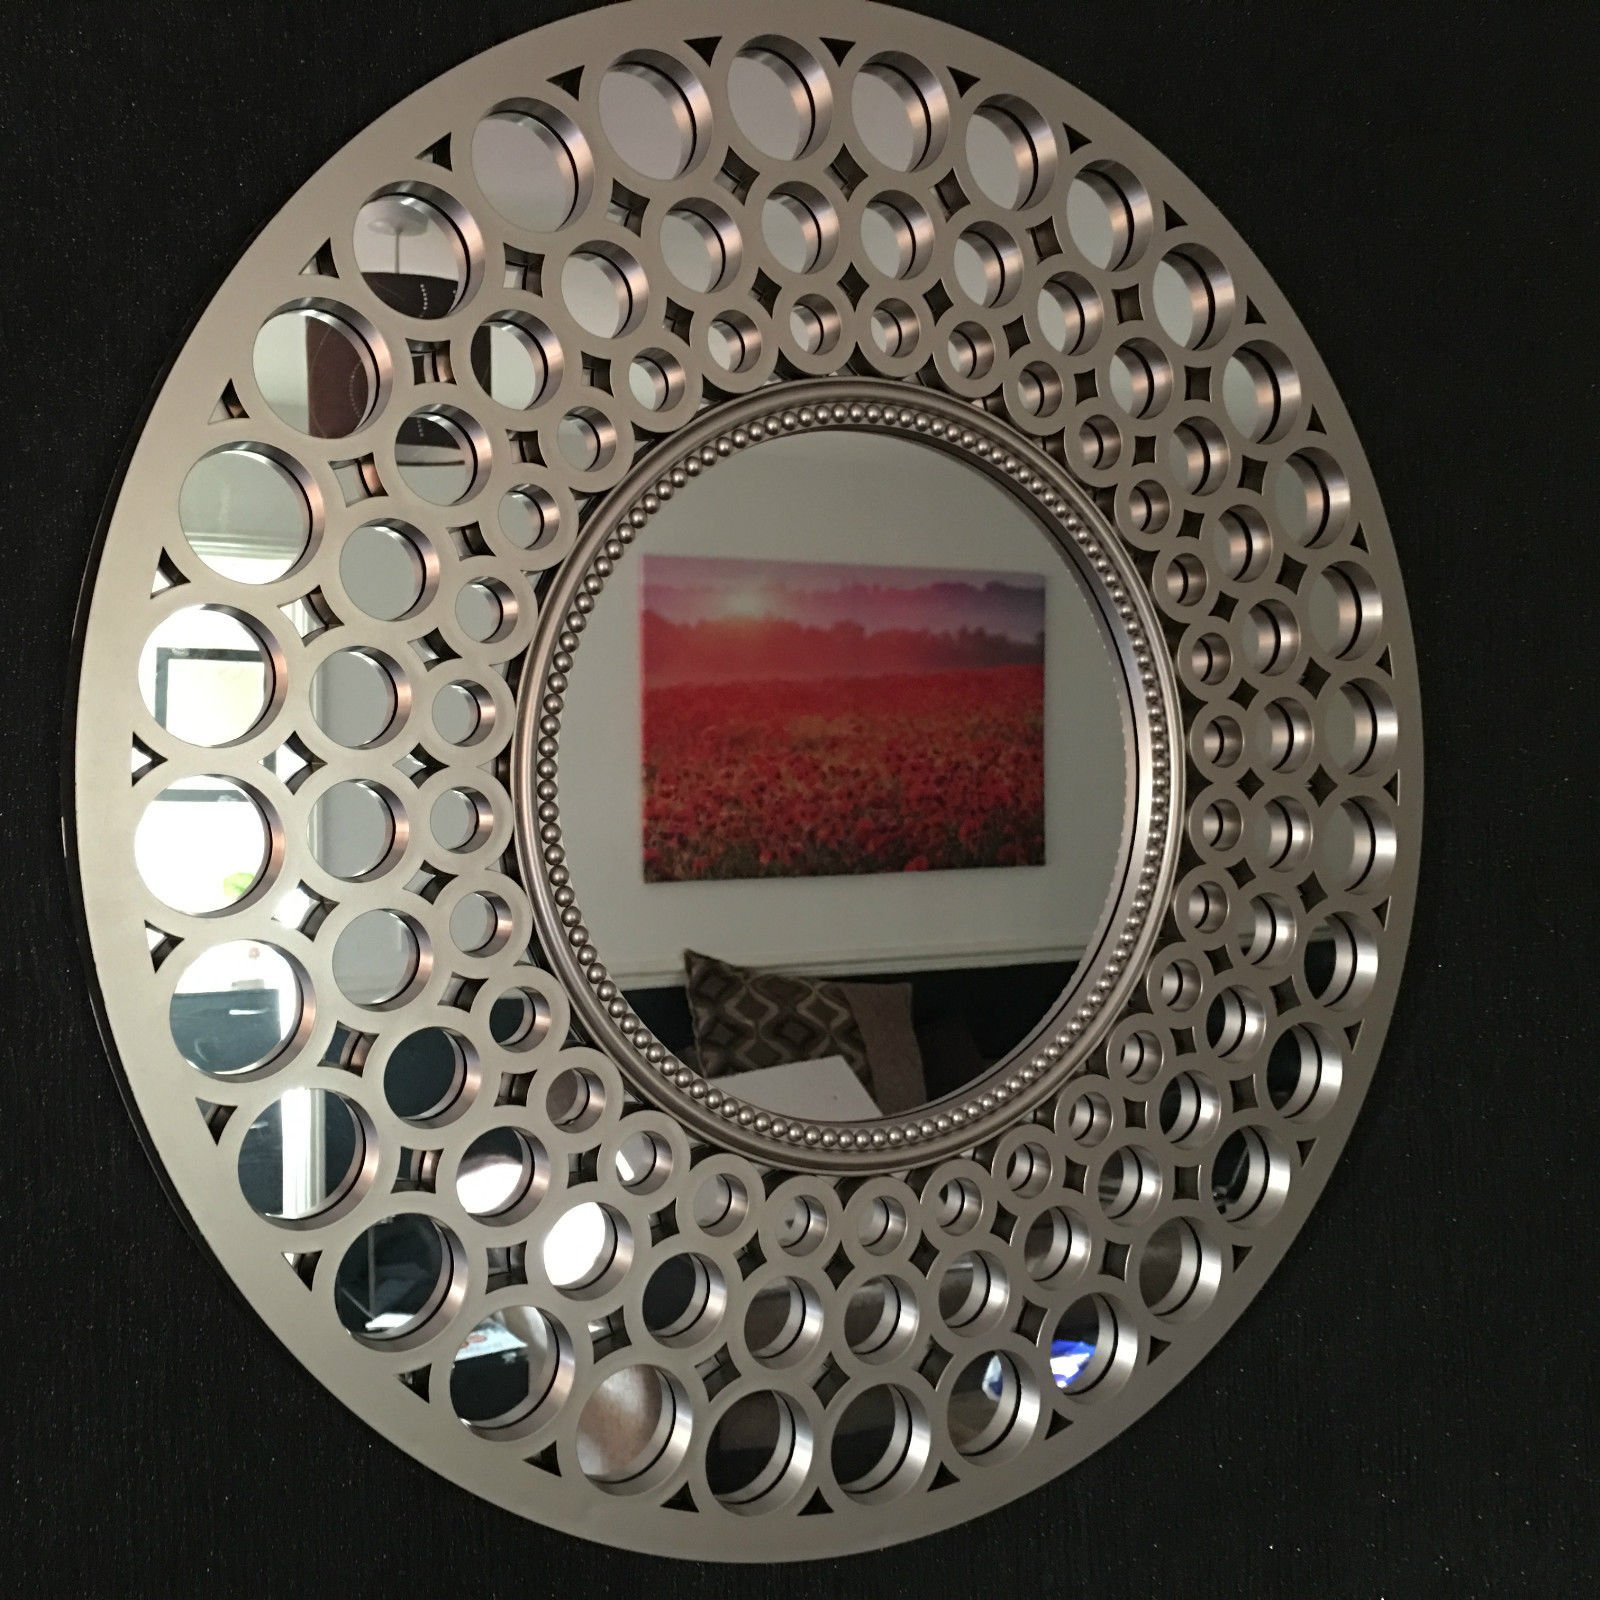 CAPRISTAR 63cm Round GOLD Mirror Home Decor Designer Wall Mirror Beautiful Decoration Art Piece Gift